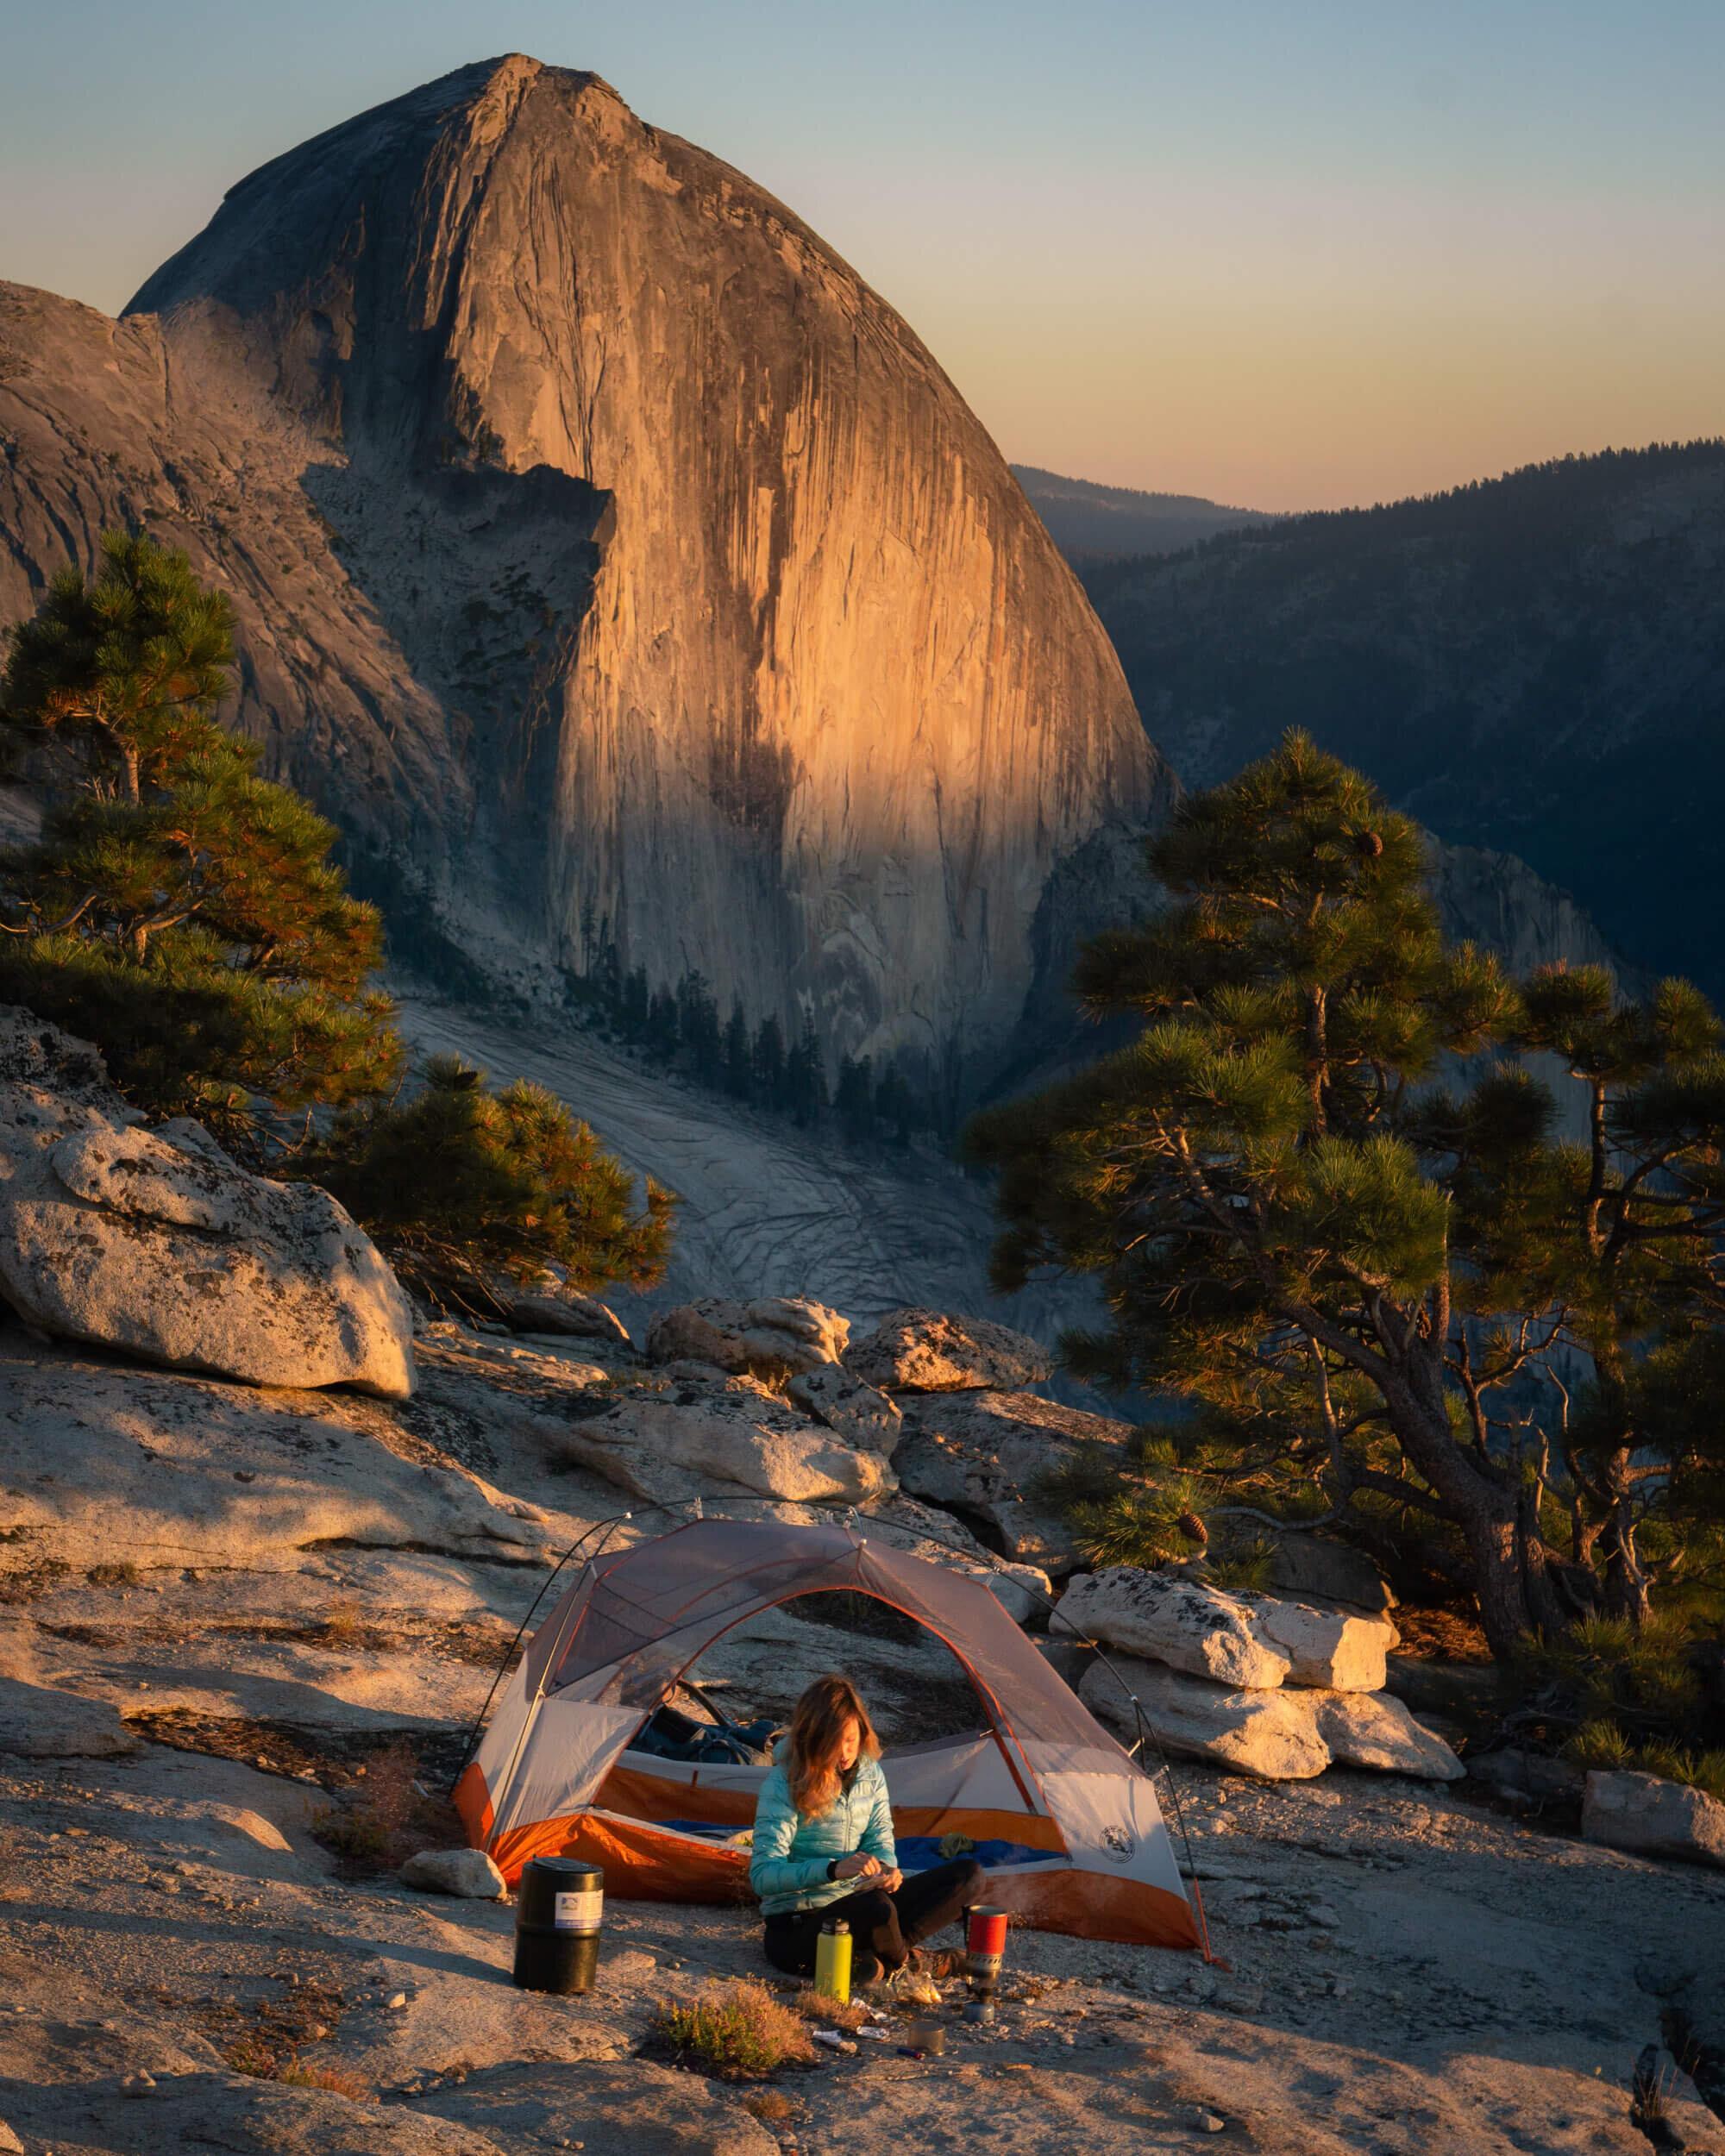 Camping at Mount Watkins in Yosemite National Park. Tent:  Big Agnes Copper Spur HV UL3